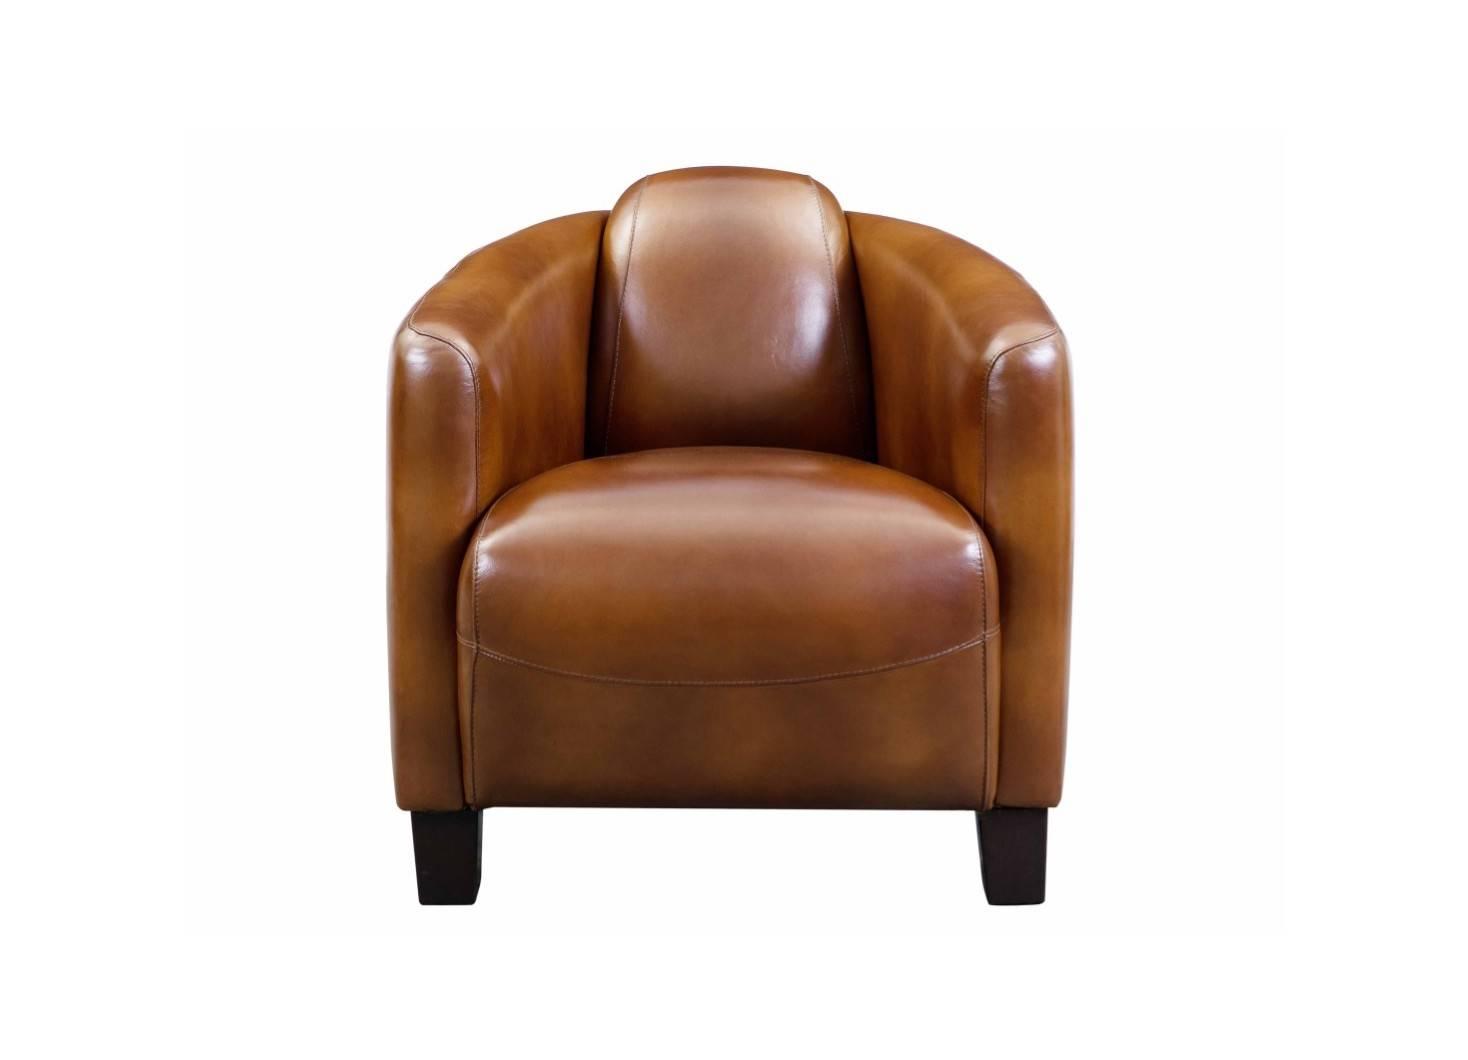 Fauteuil club Barquette - cuir marron vintage